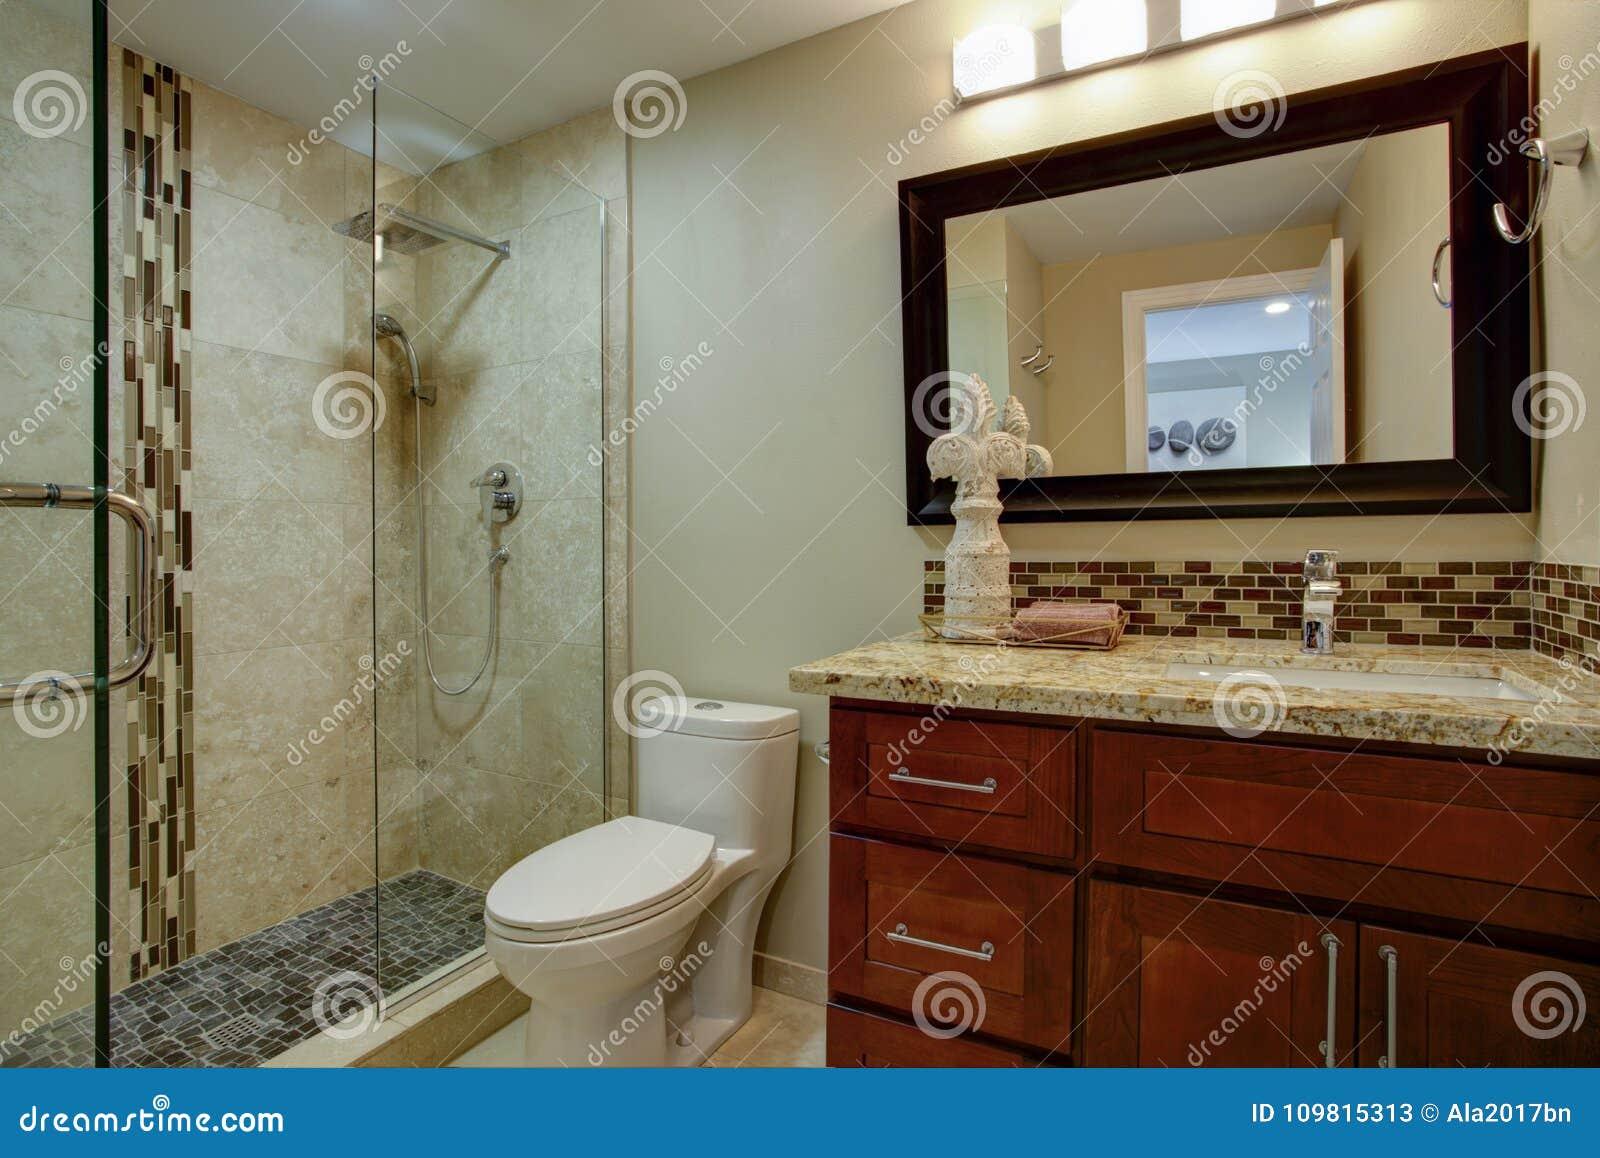 Vasca Da Bagno Macchiata : Bagno elegante con una vanità macchiata mogano immagine stock